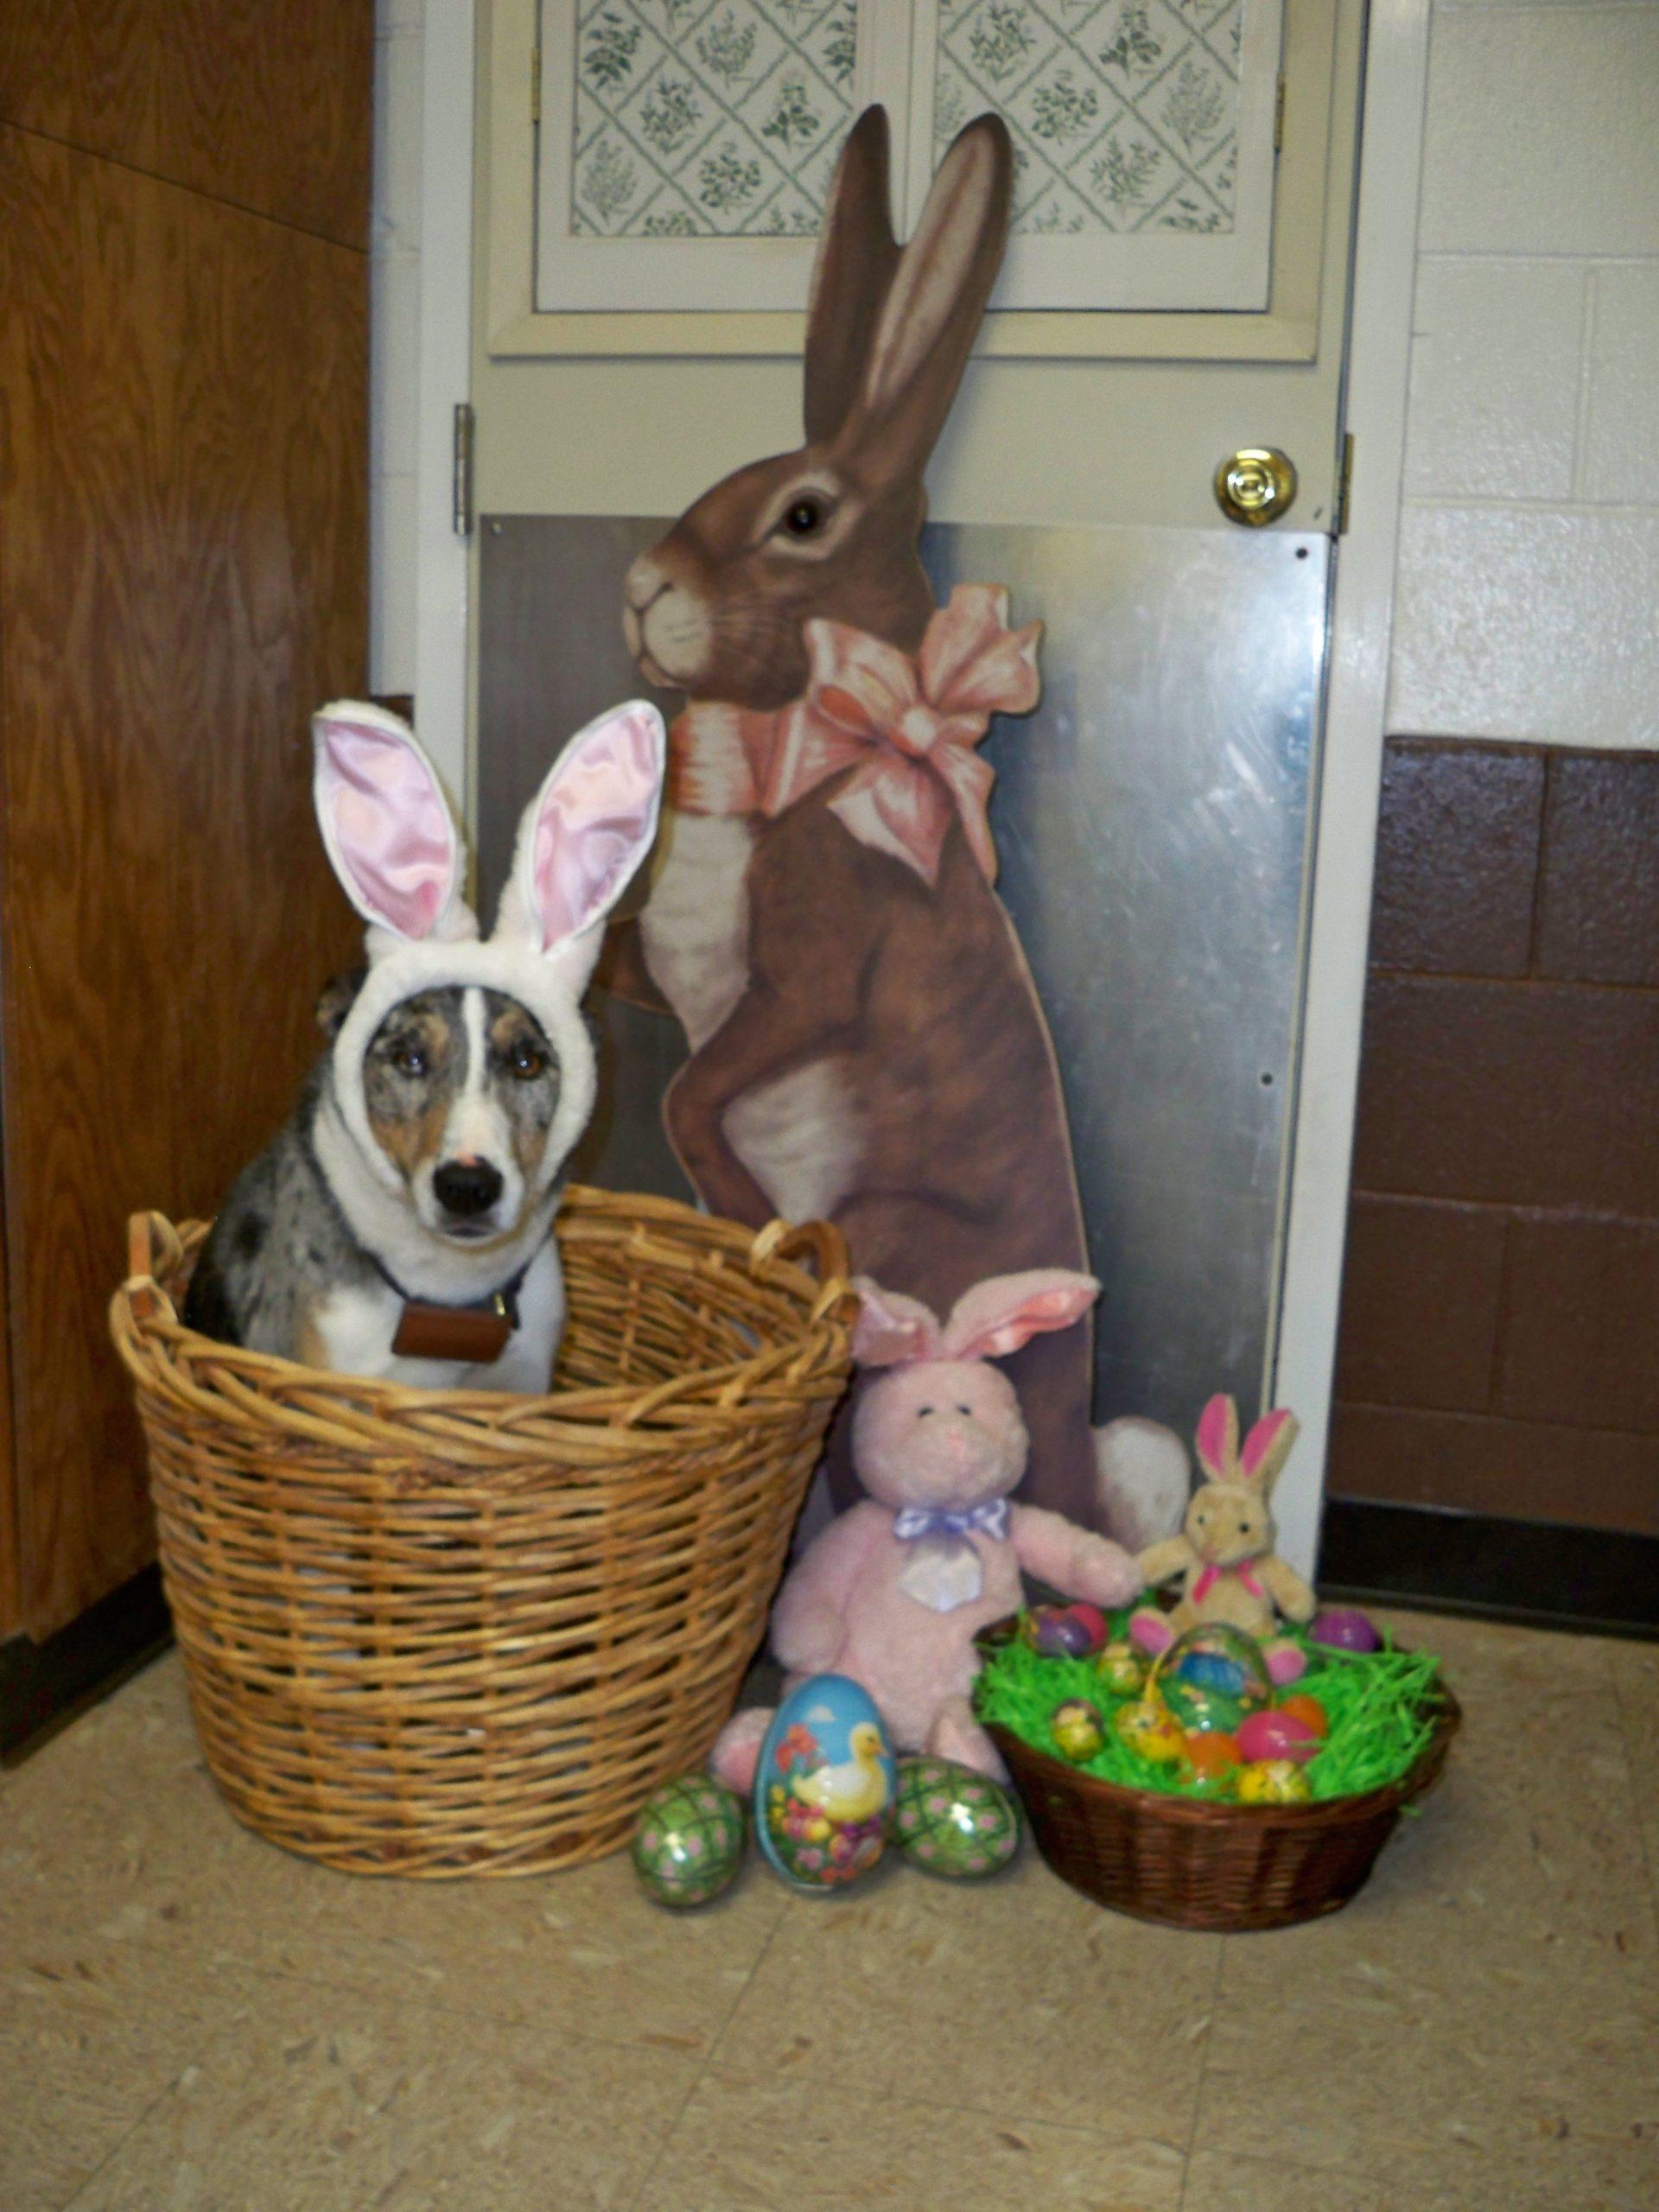 Finn waits for the Easter Bunny